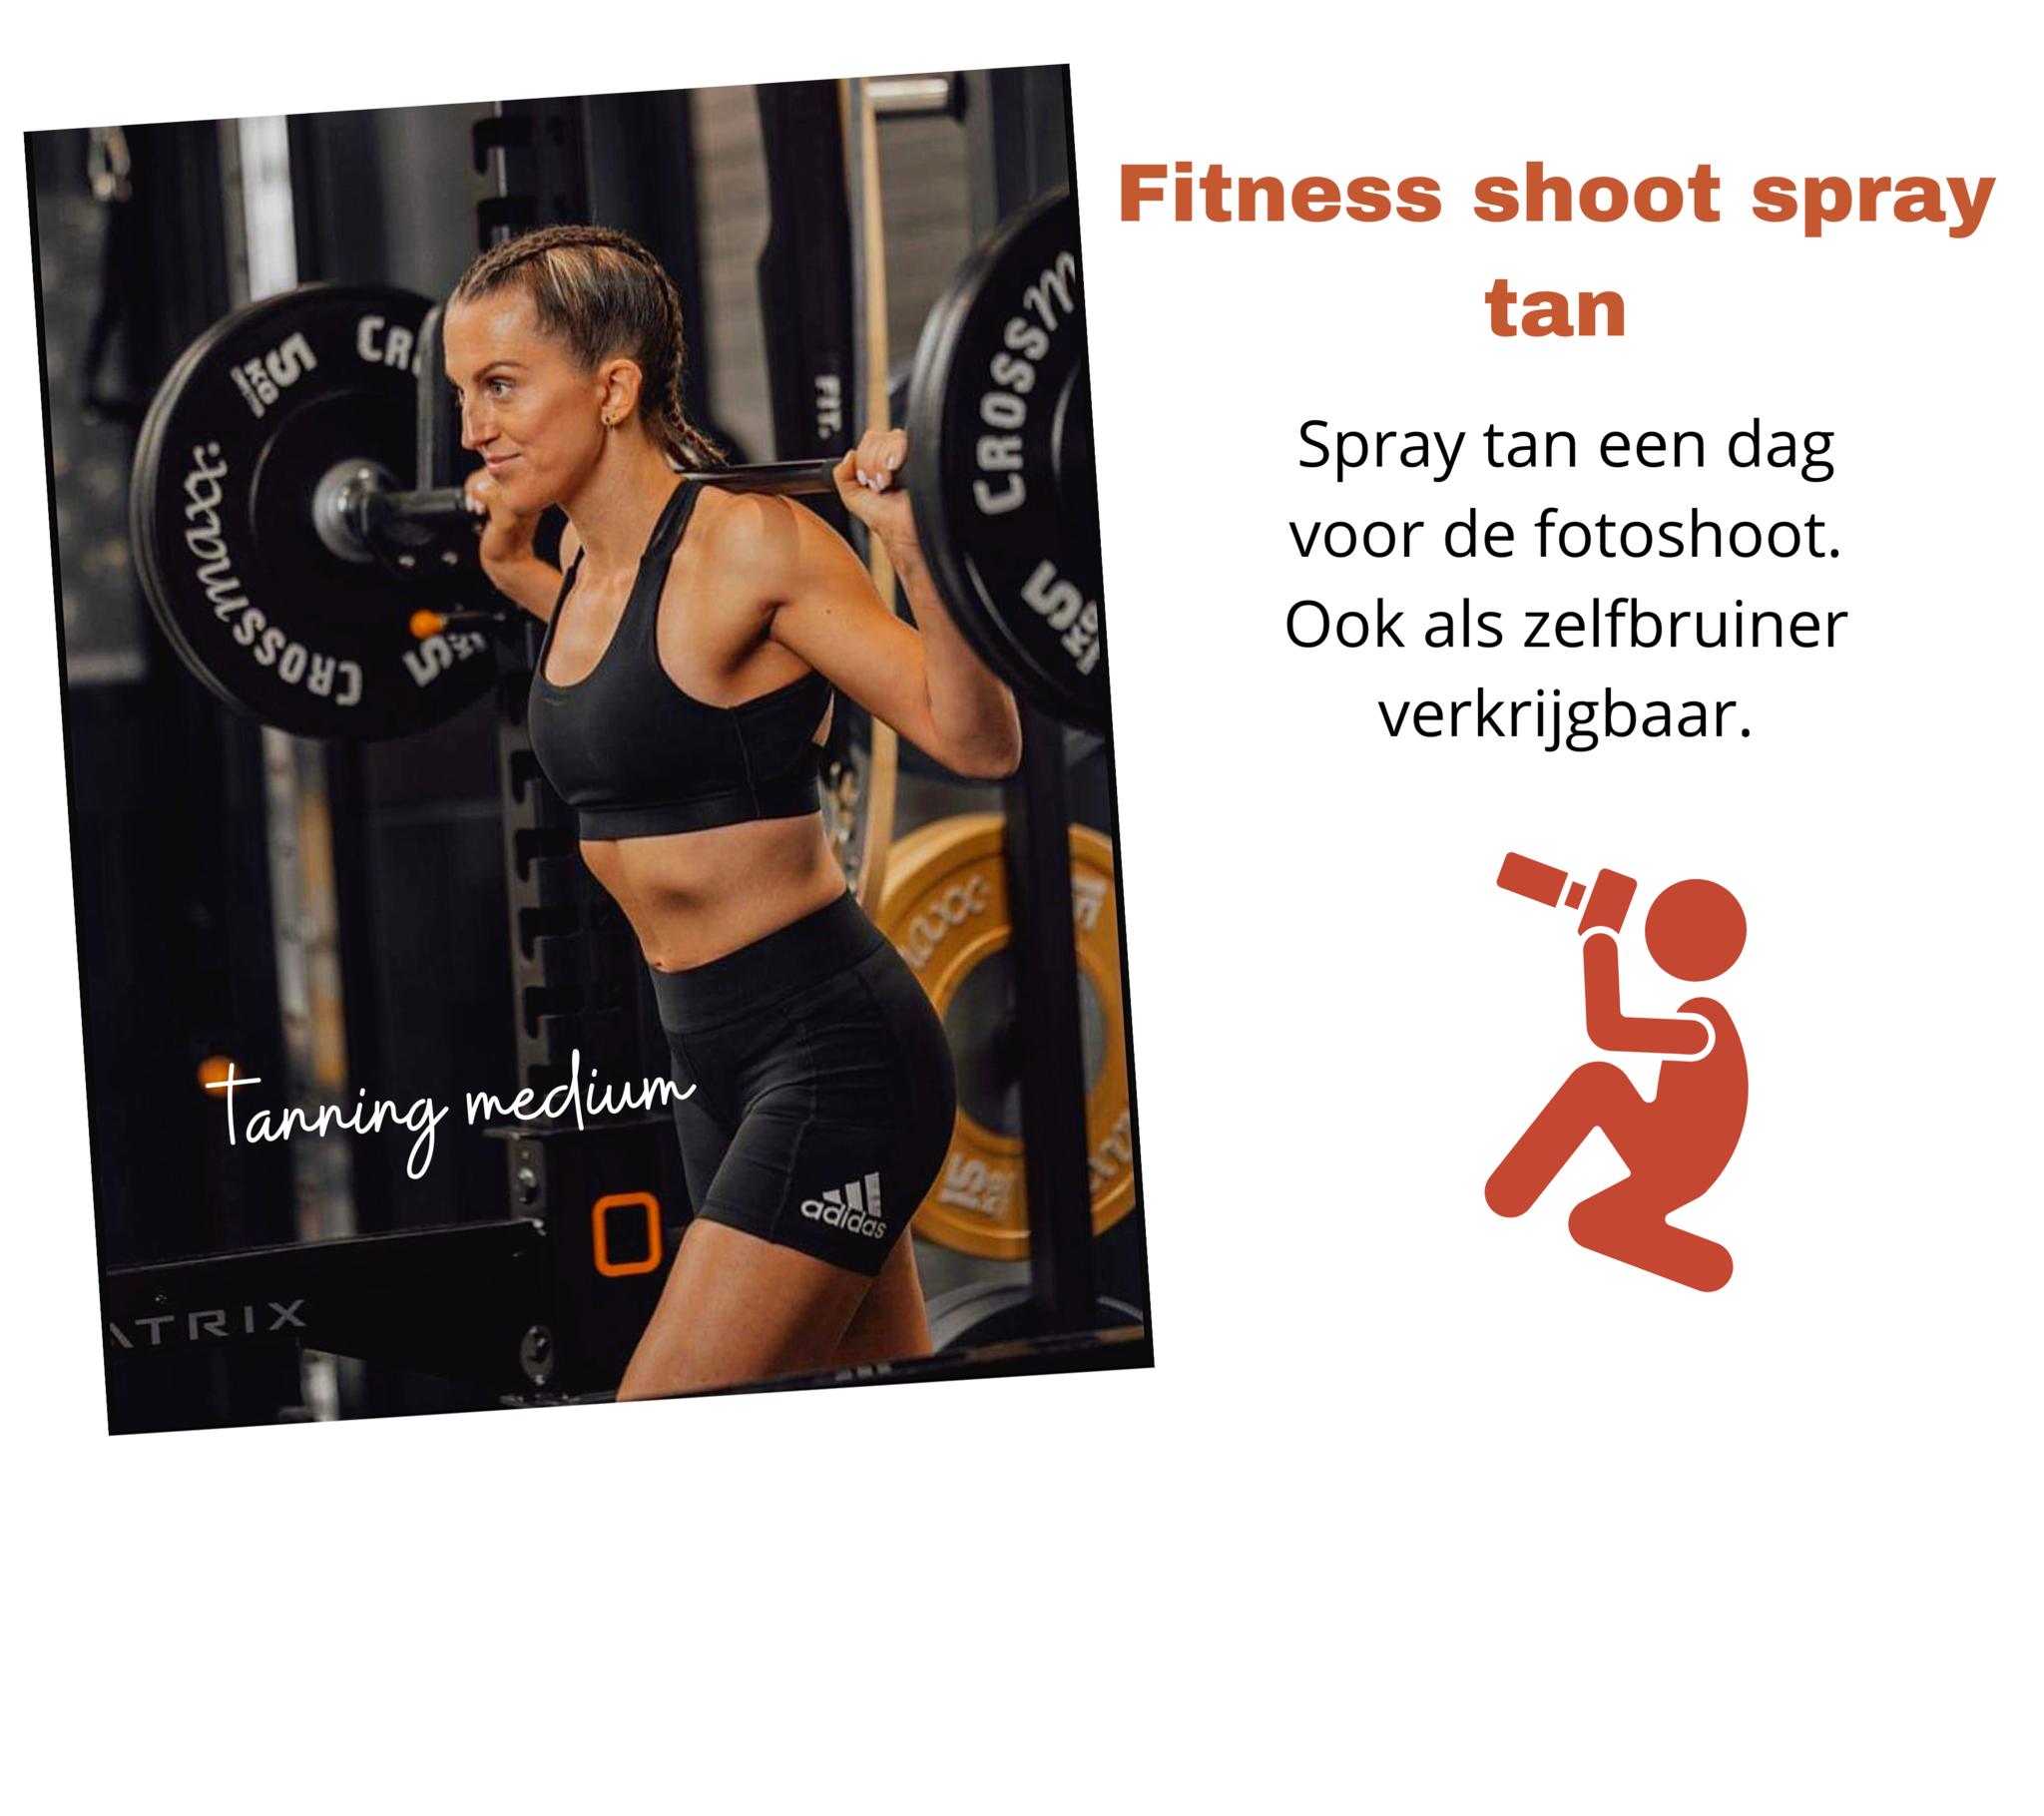 fitness shoot spray tan